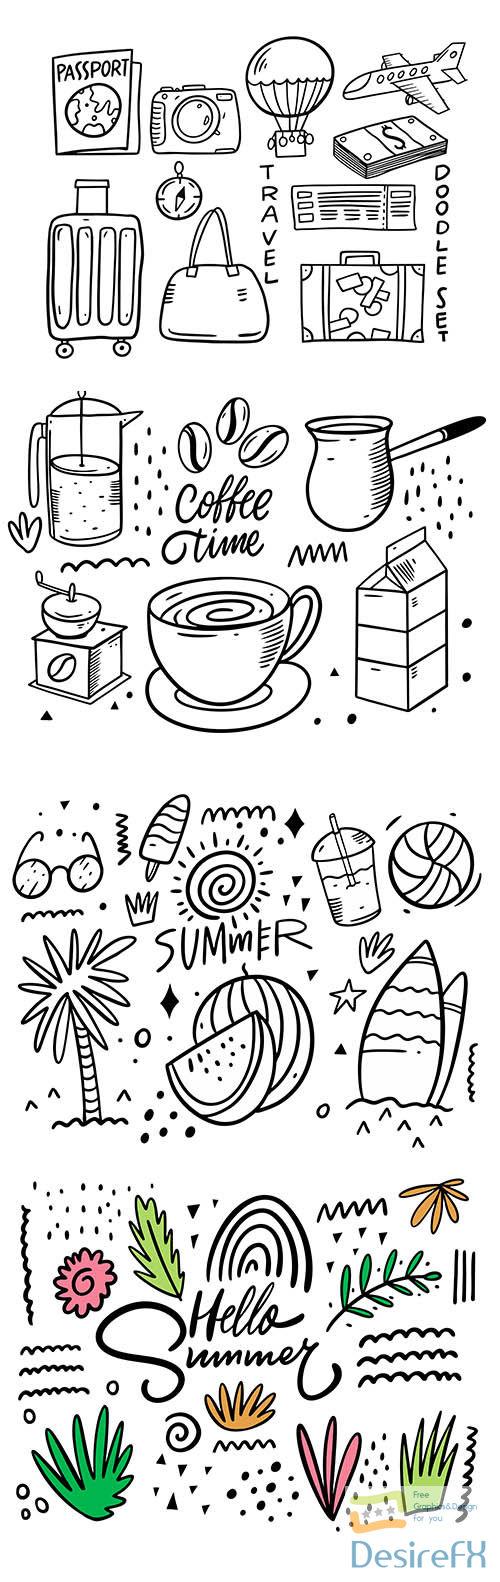 Abstract doodles elements set